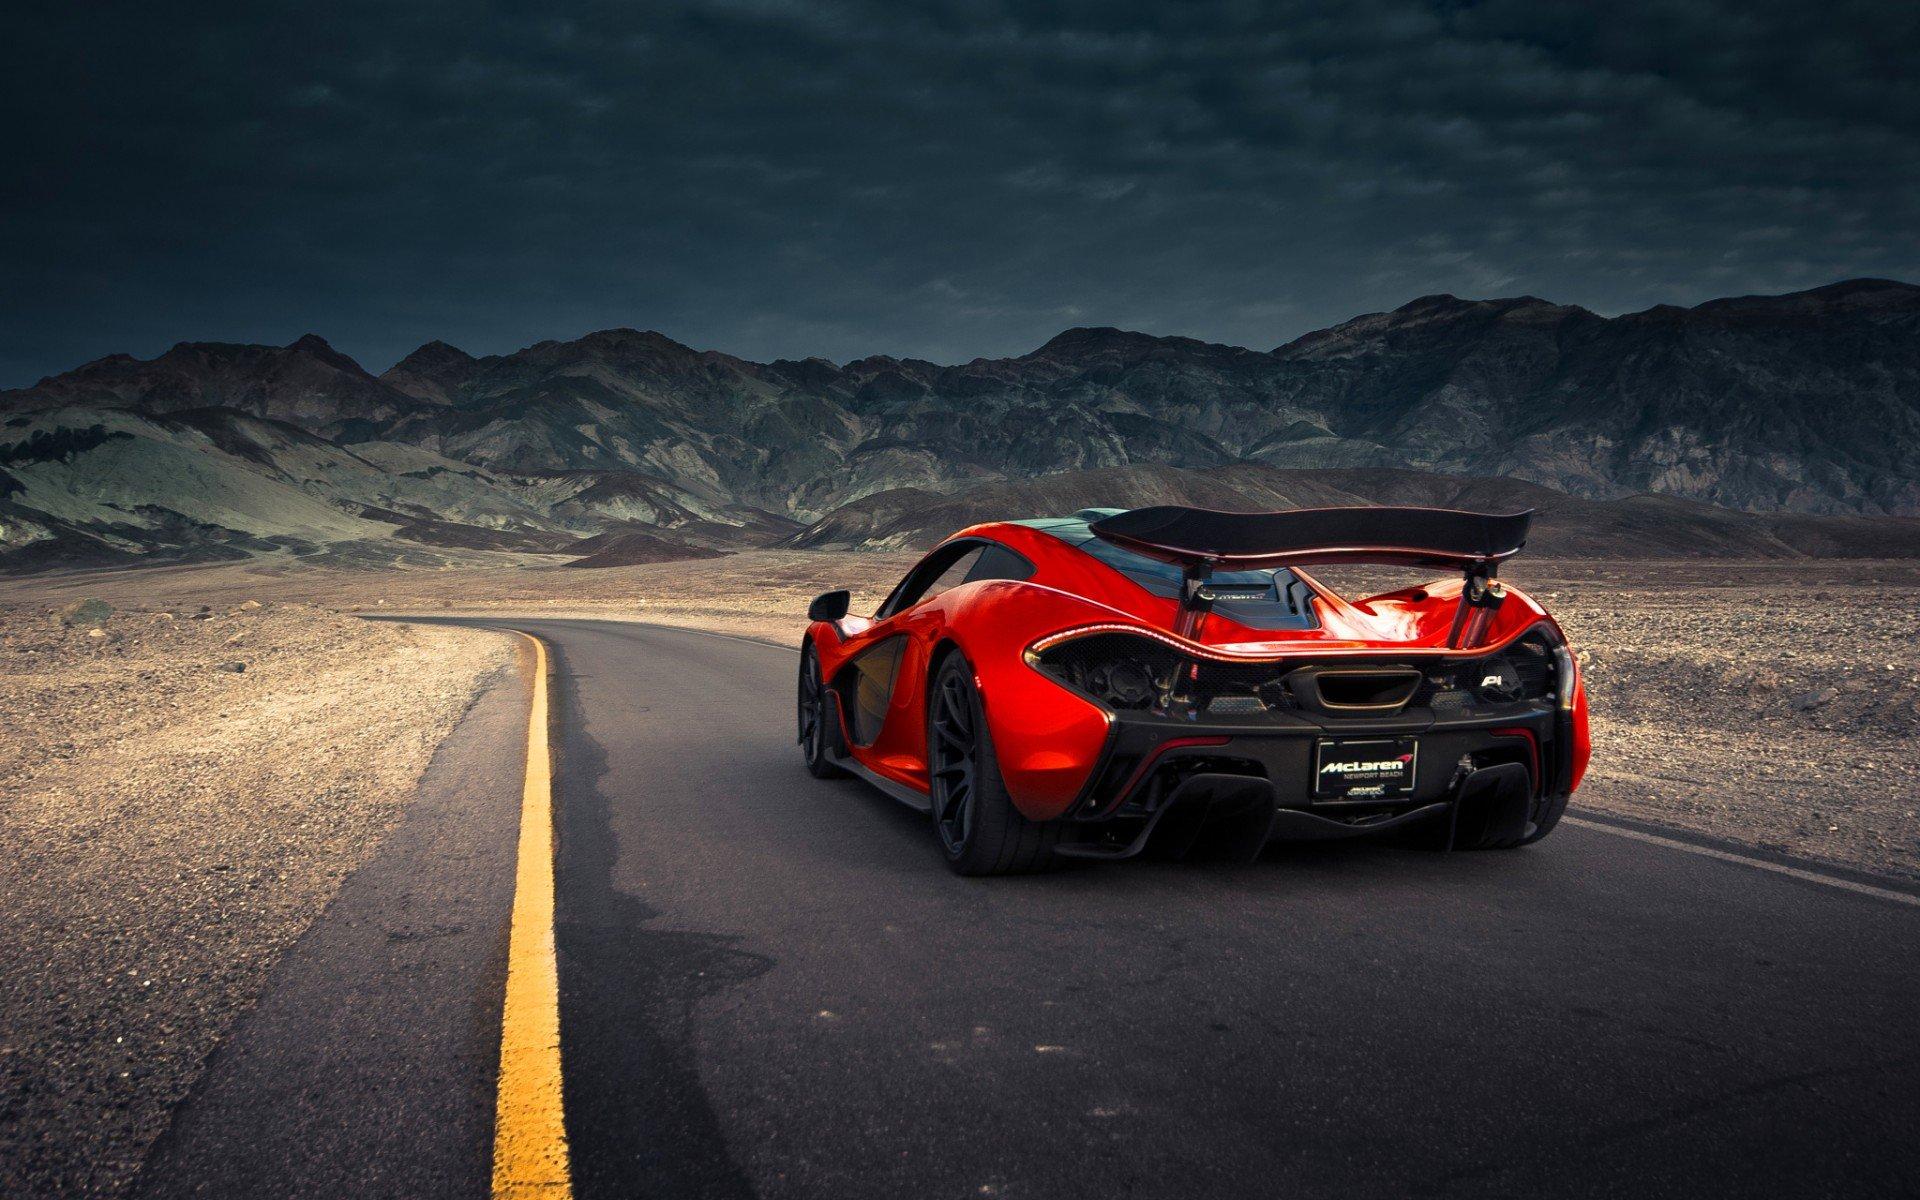 High Resolution Sports Car Hd 1920x1200 Wallpaper Id 207437 For Pc